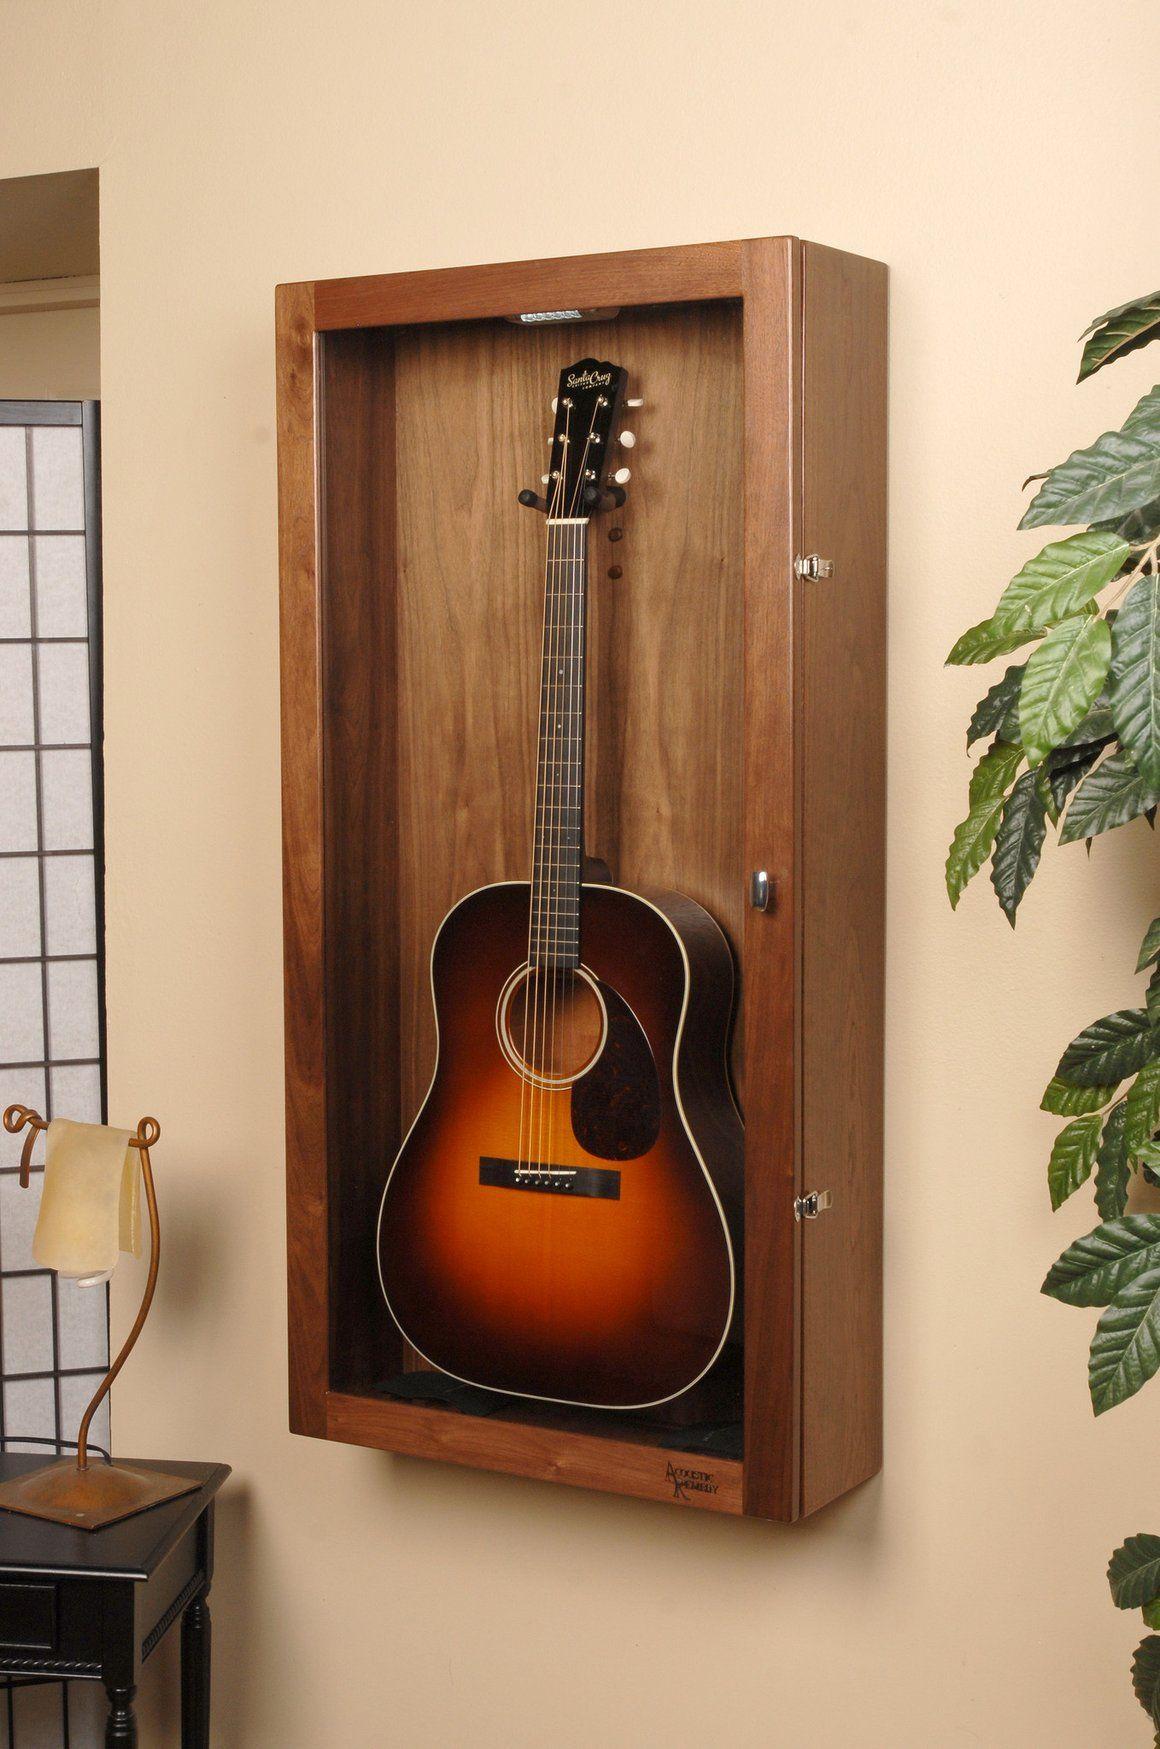 Rectangle Wall Mounted Humidified Guitar Display Case Acoustic Remedy Guitar Display Case Guitar Display Guitar